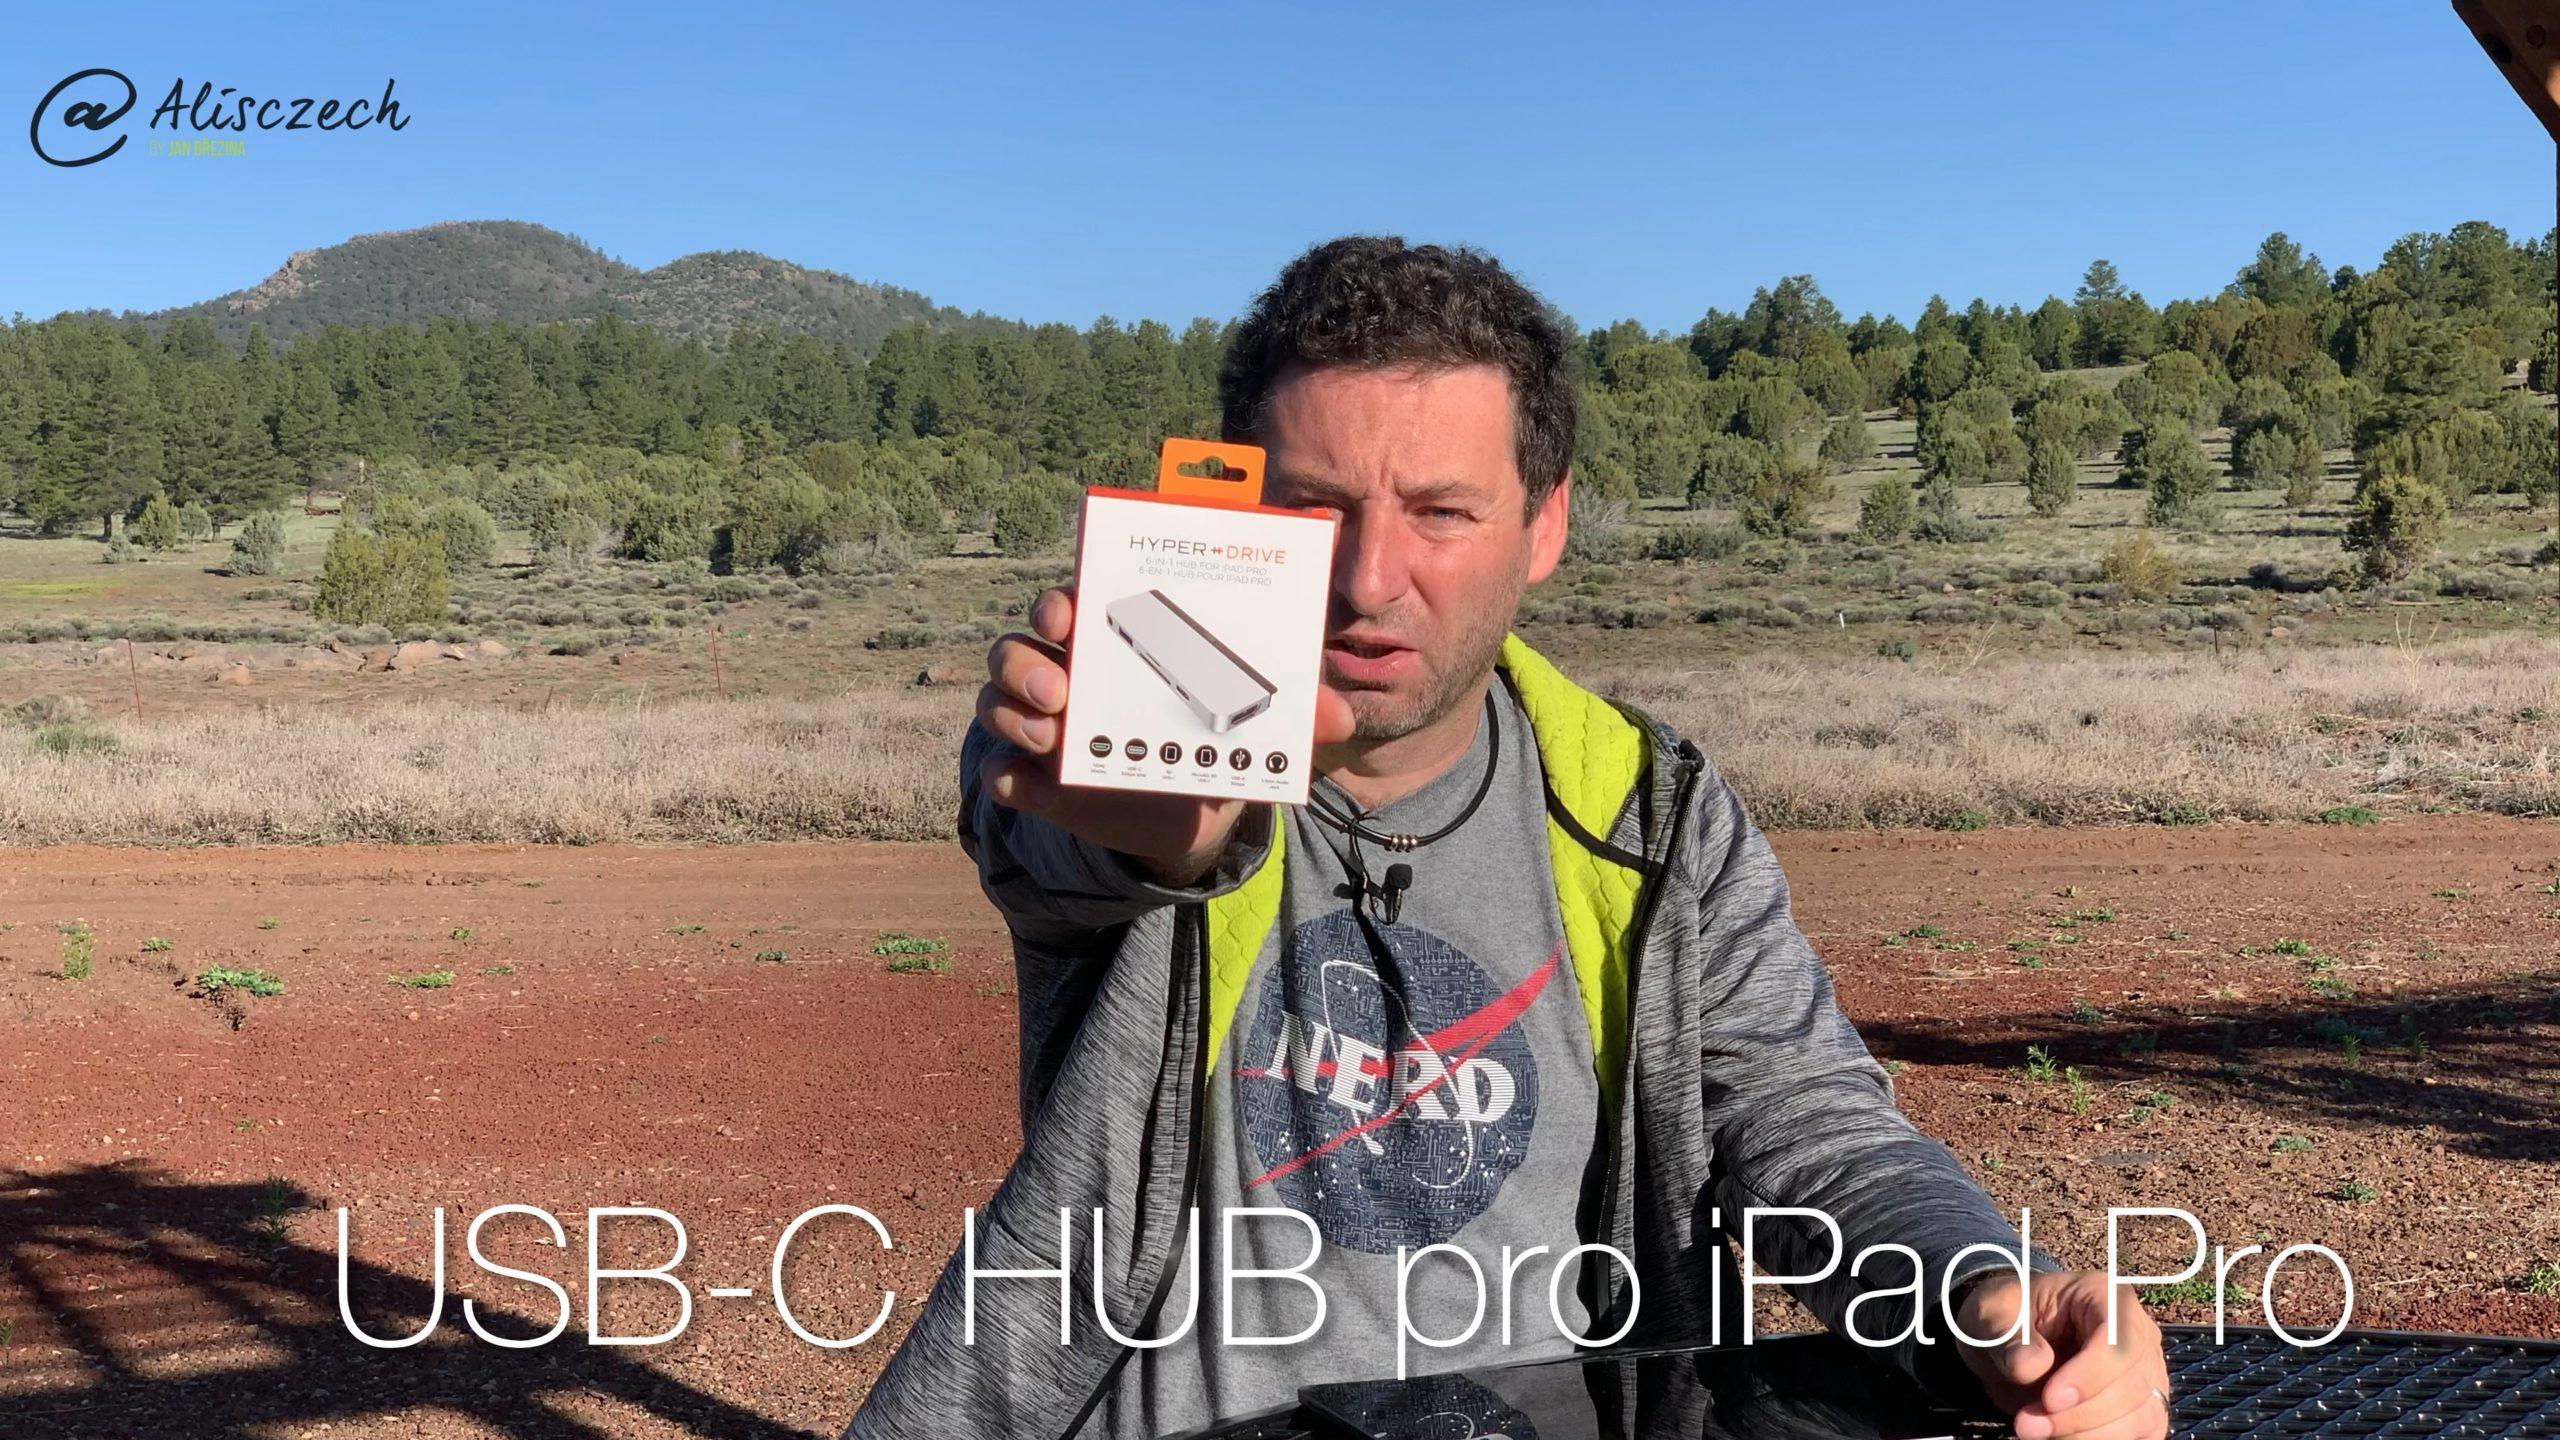 Hyper USB-C HUB pro iPad Pro